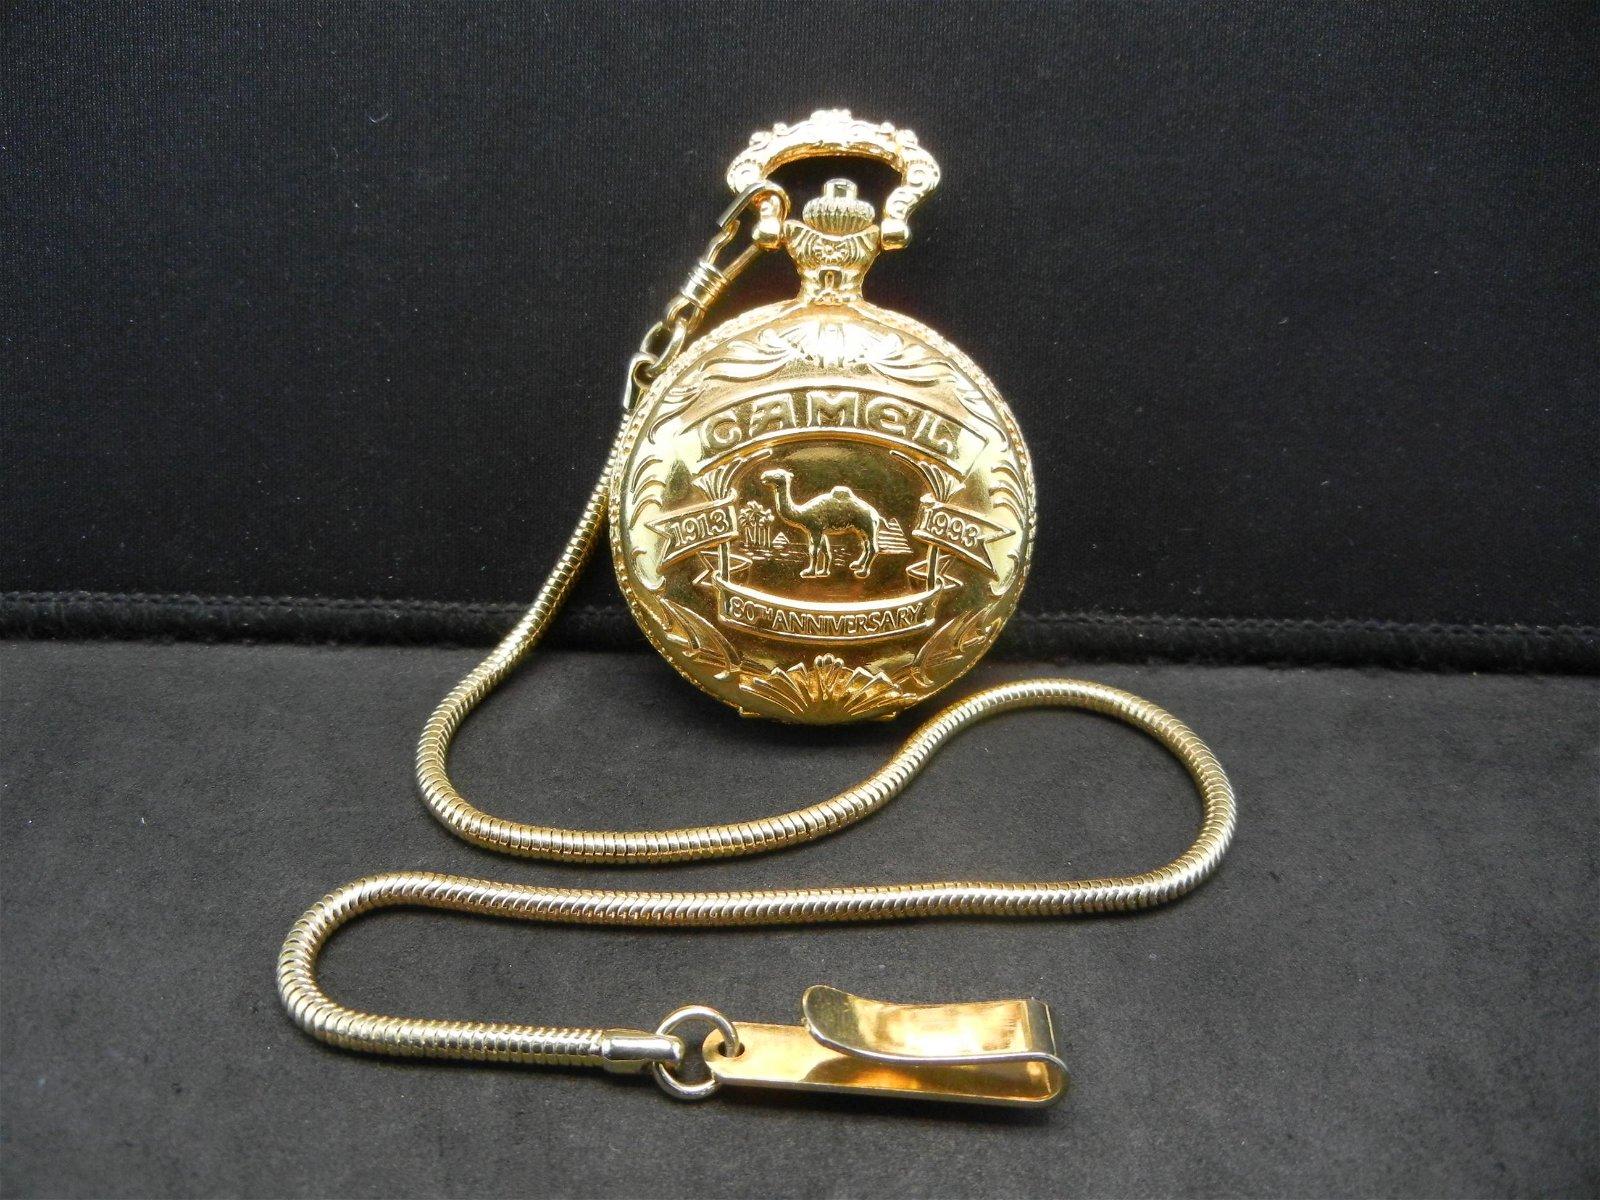 CAMEL SMOKES pocket watch.